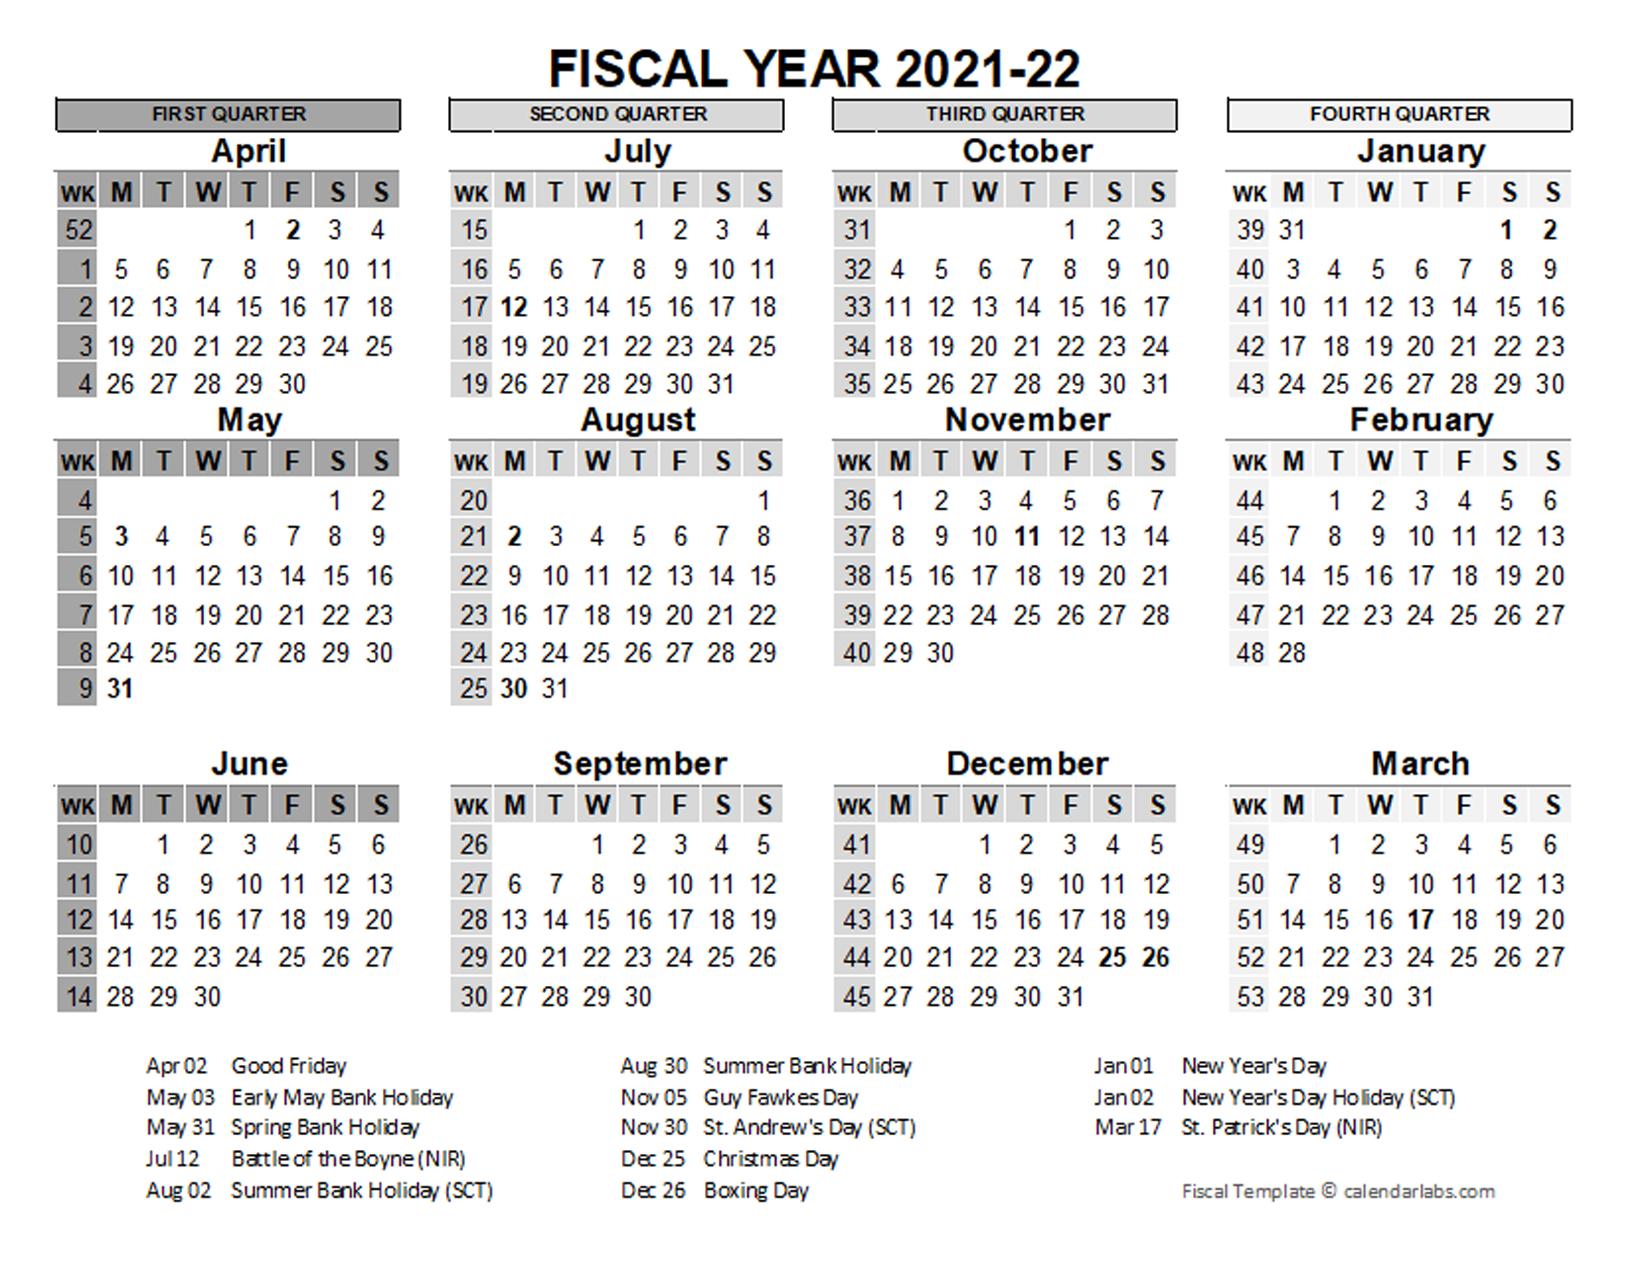 Fiscal Year Calender Print October | Calendar Printables within Walmart Fiscal Calendar For 2022